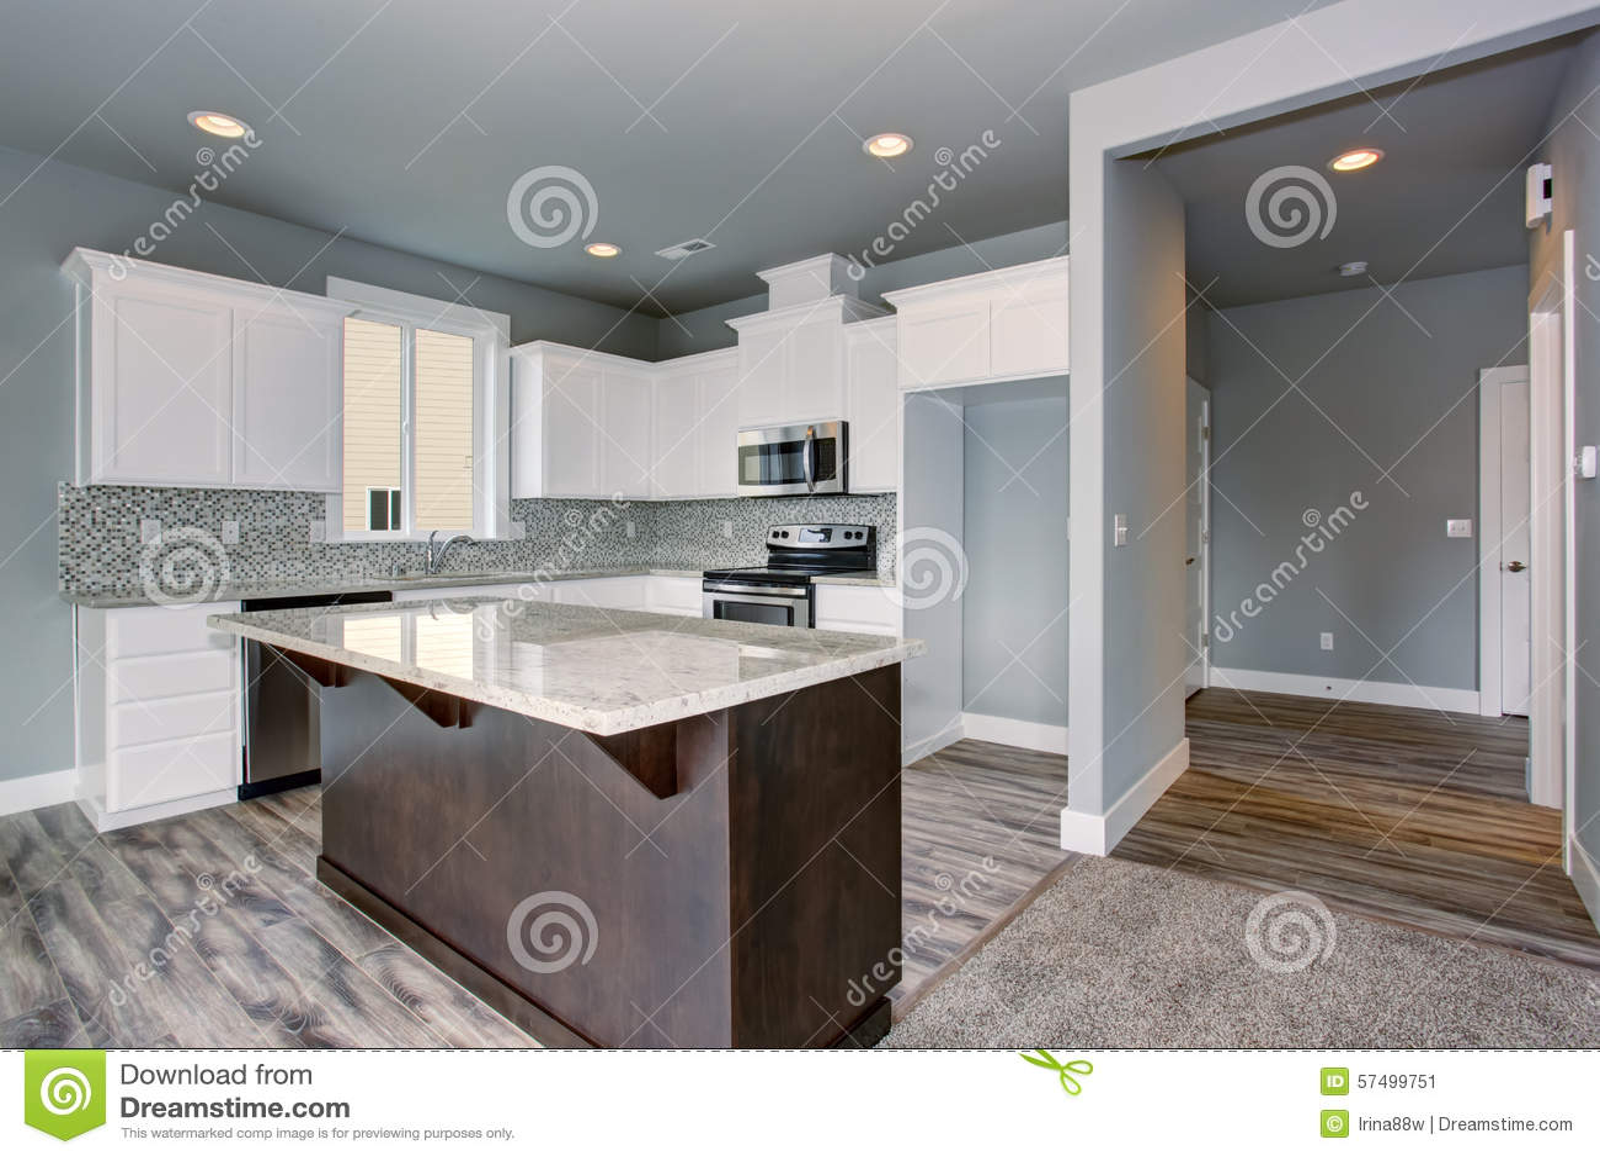 Pavimento Bianco E Grigio : Pavimento cucina grigio. trendy pavimento grigio chiaro colore